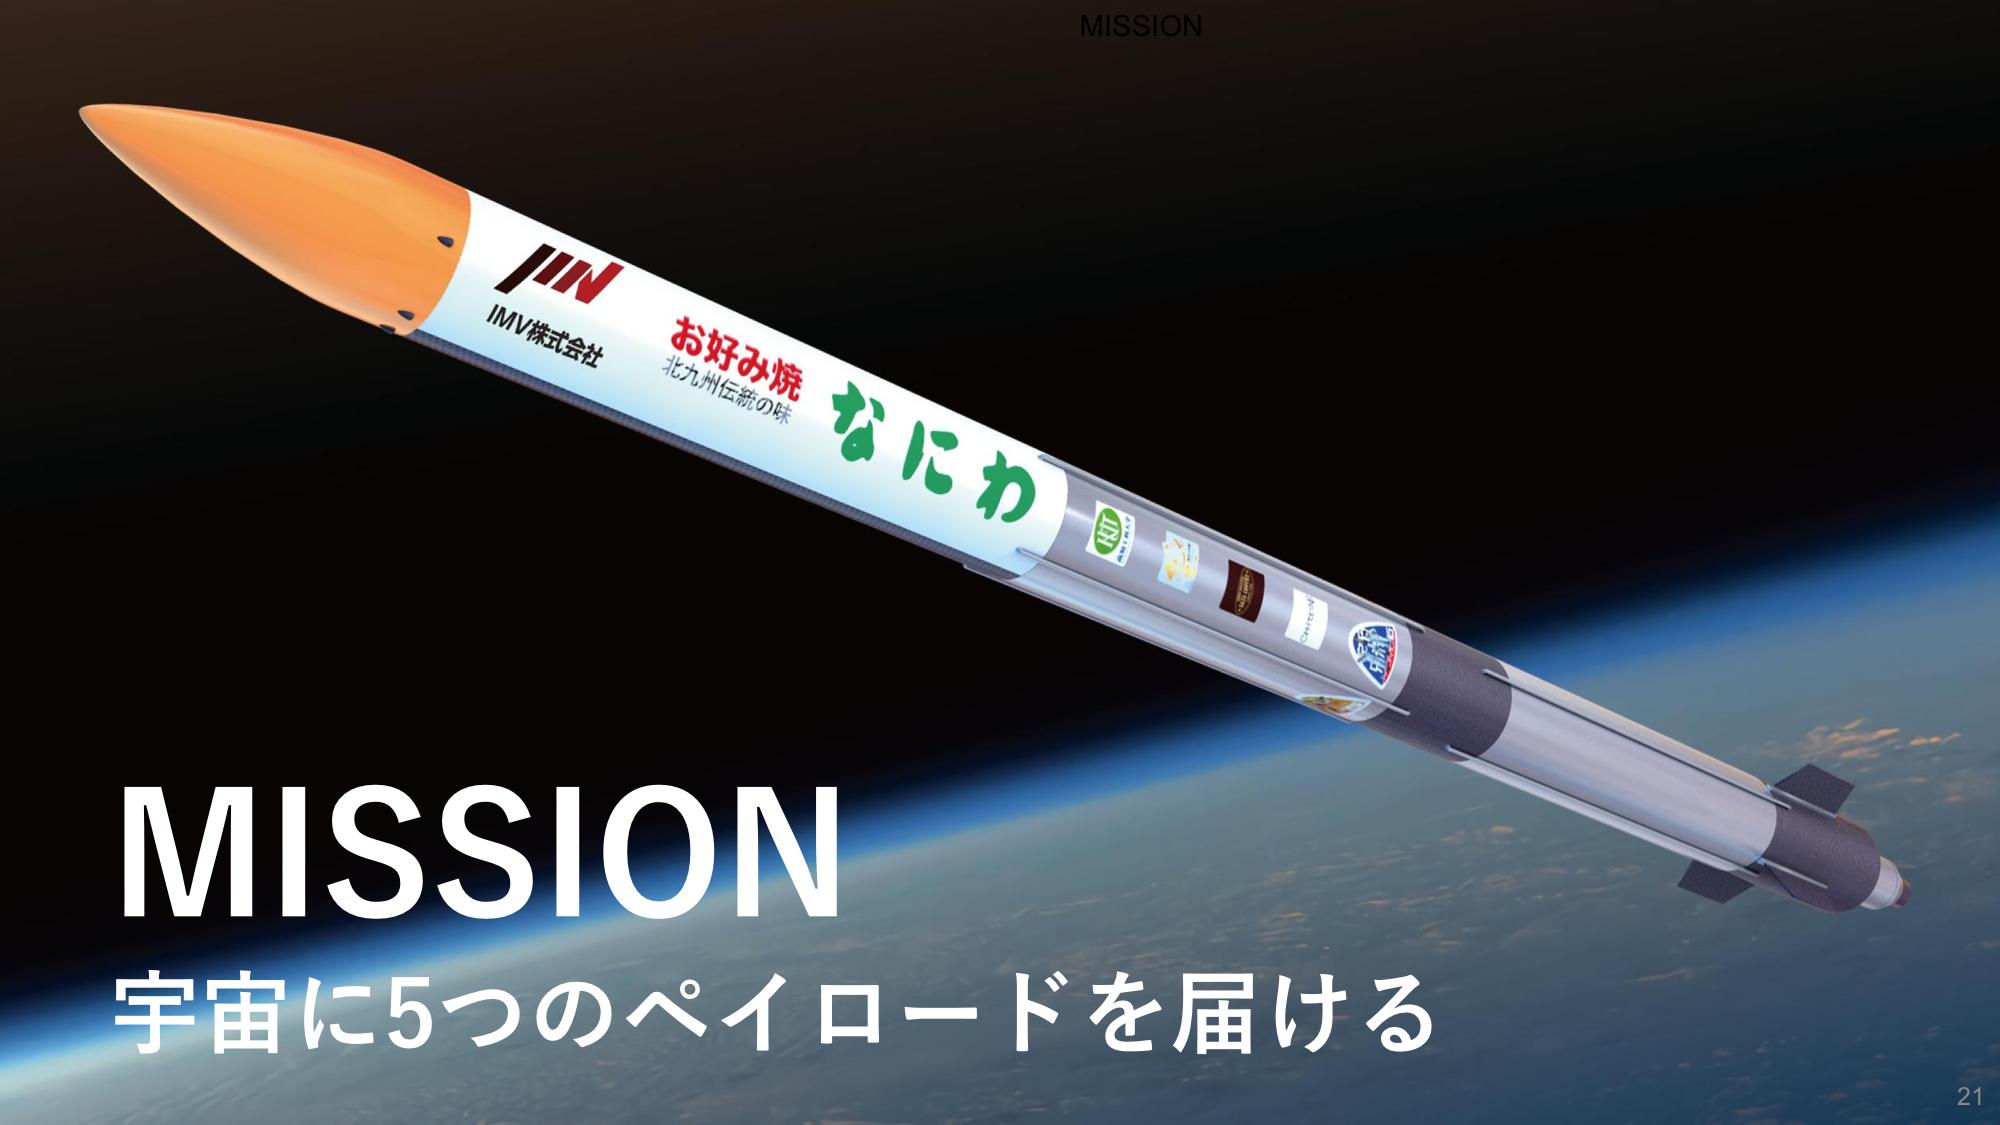 f:id:Imamura:20191126135209p:plain